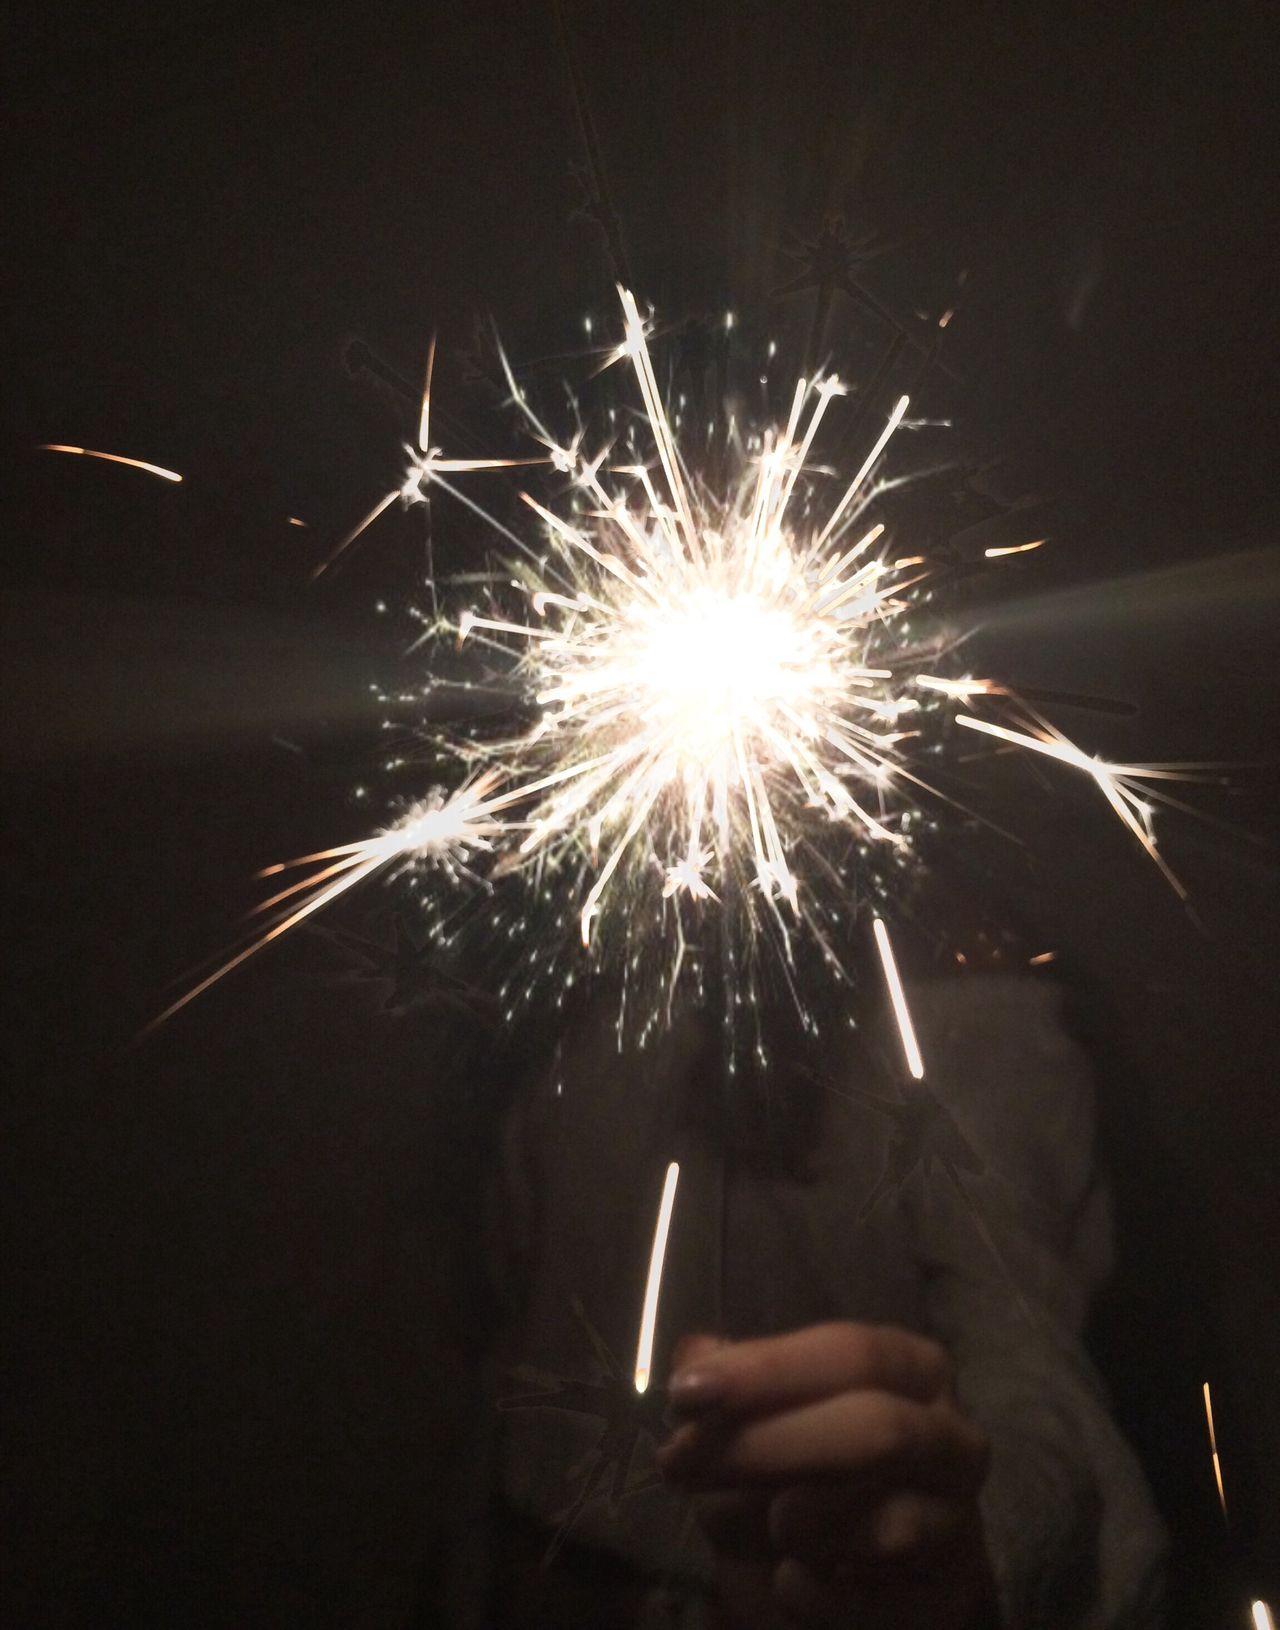 Light Illuminated Glowing Night Sparks Dark Celebration ✨ Photography TakeoverContrast ✌🏼️✌🏼✌🏼